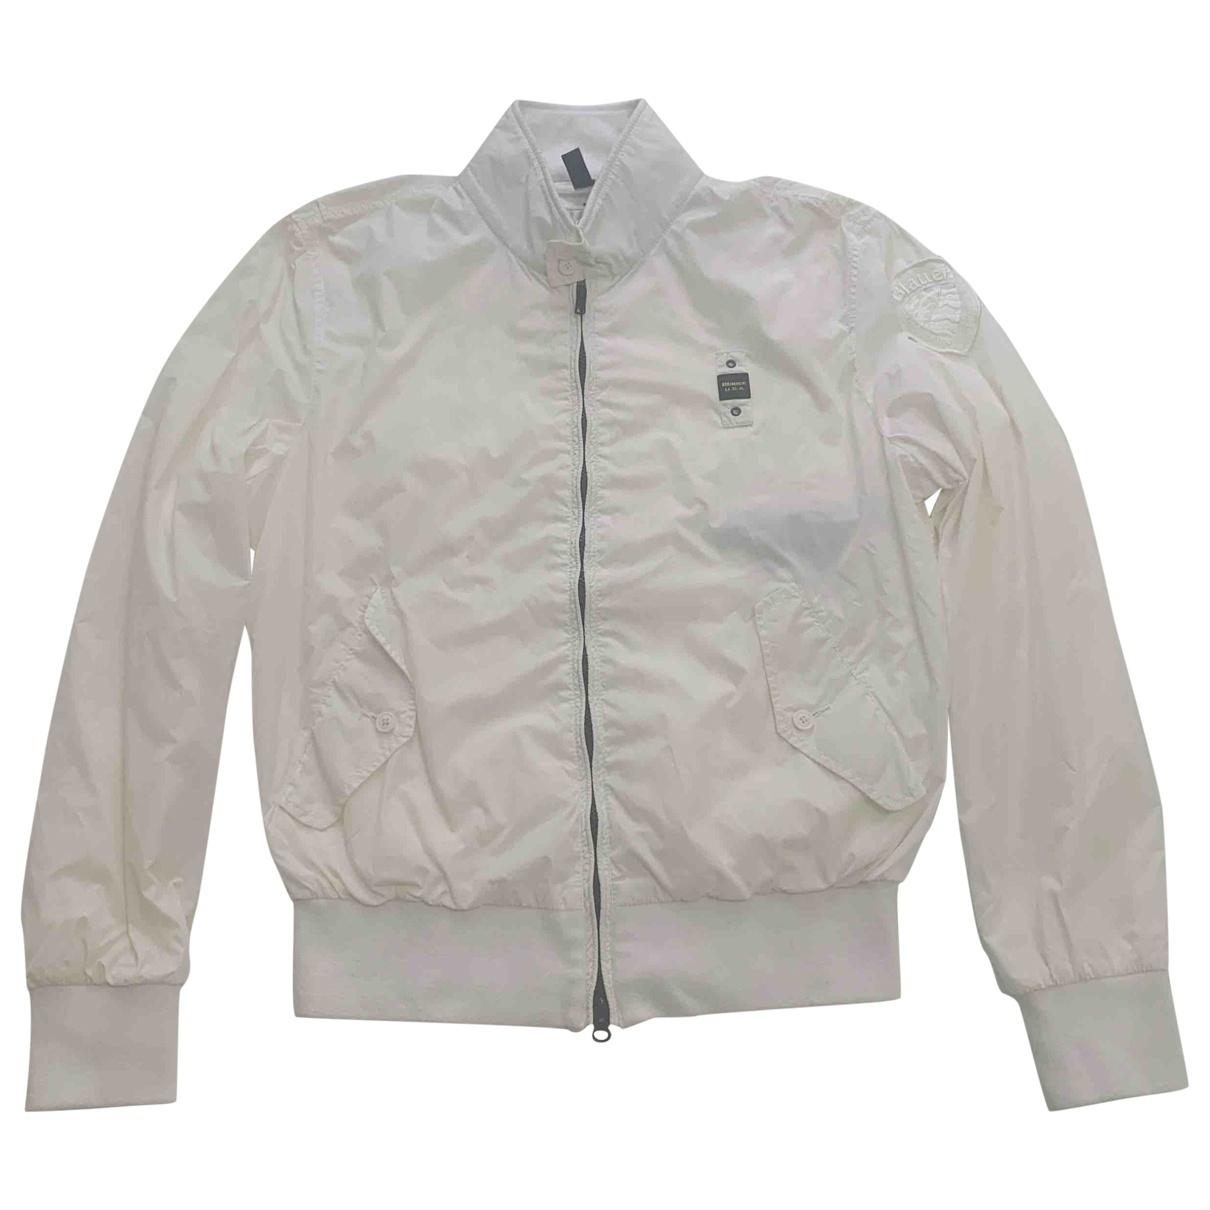 Blauer \N White jacket  for Men XL International